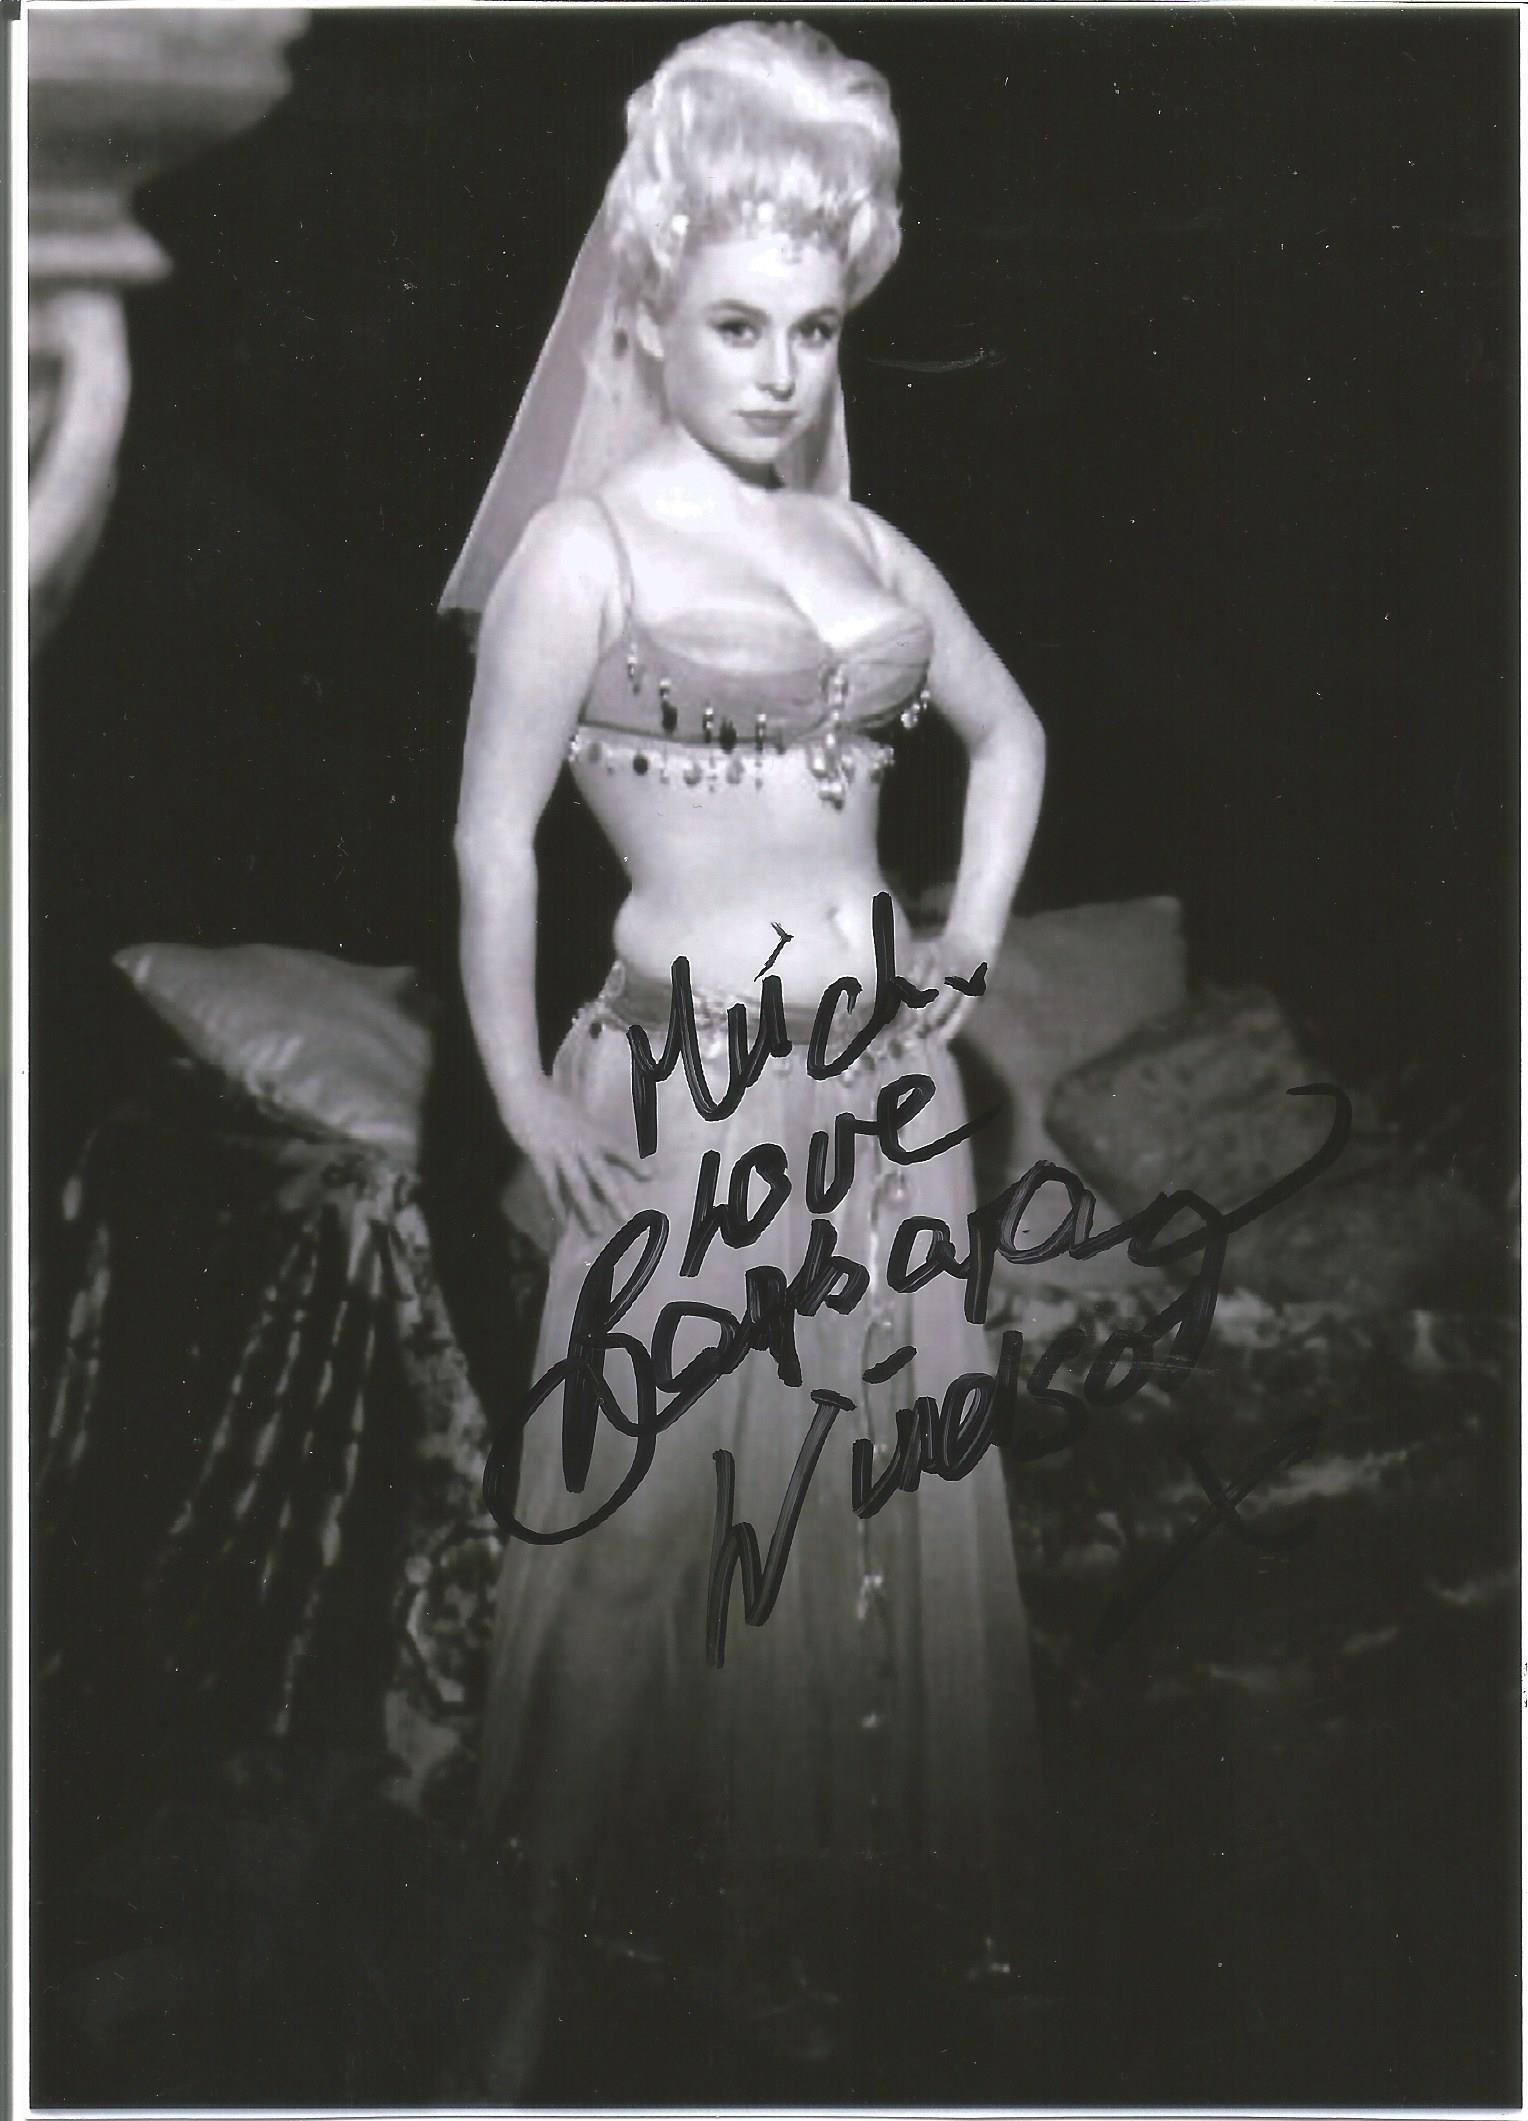 Barbara Windsor Actress Signed Carry On 5x7 Photo .